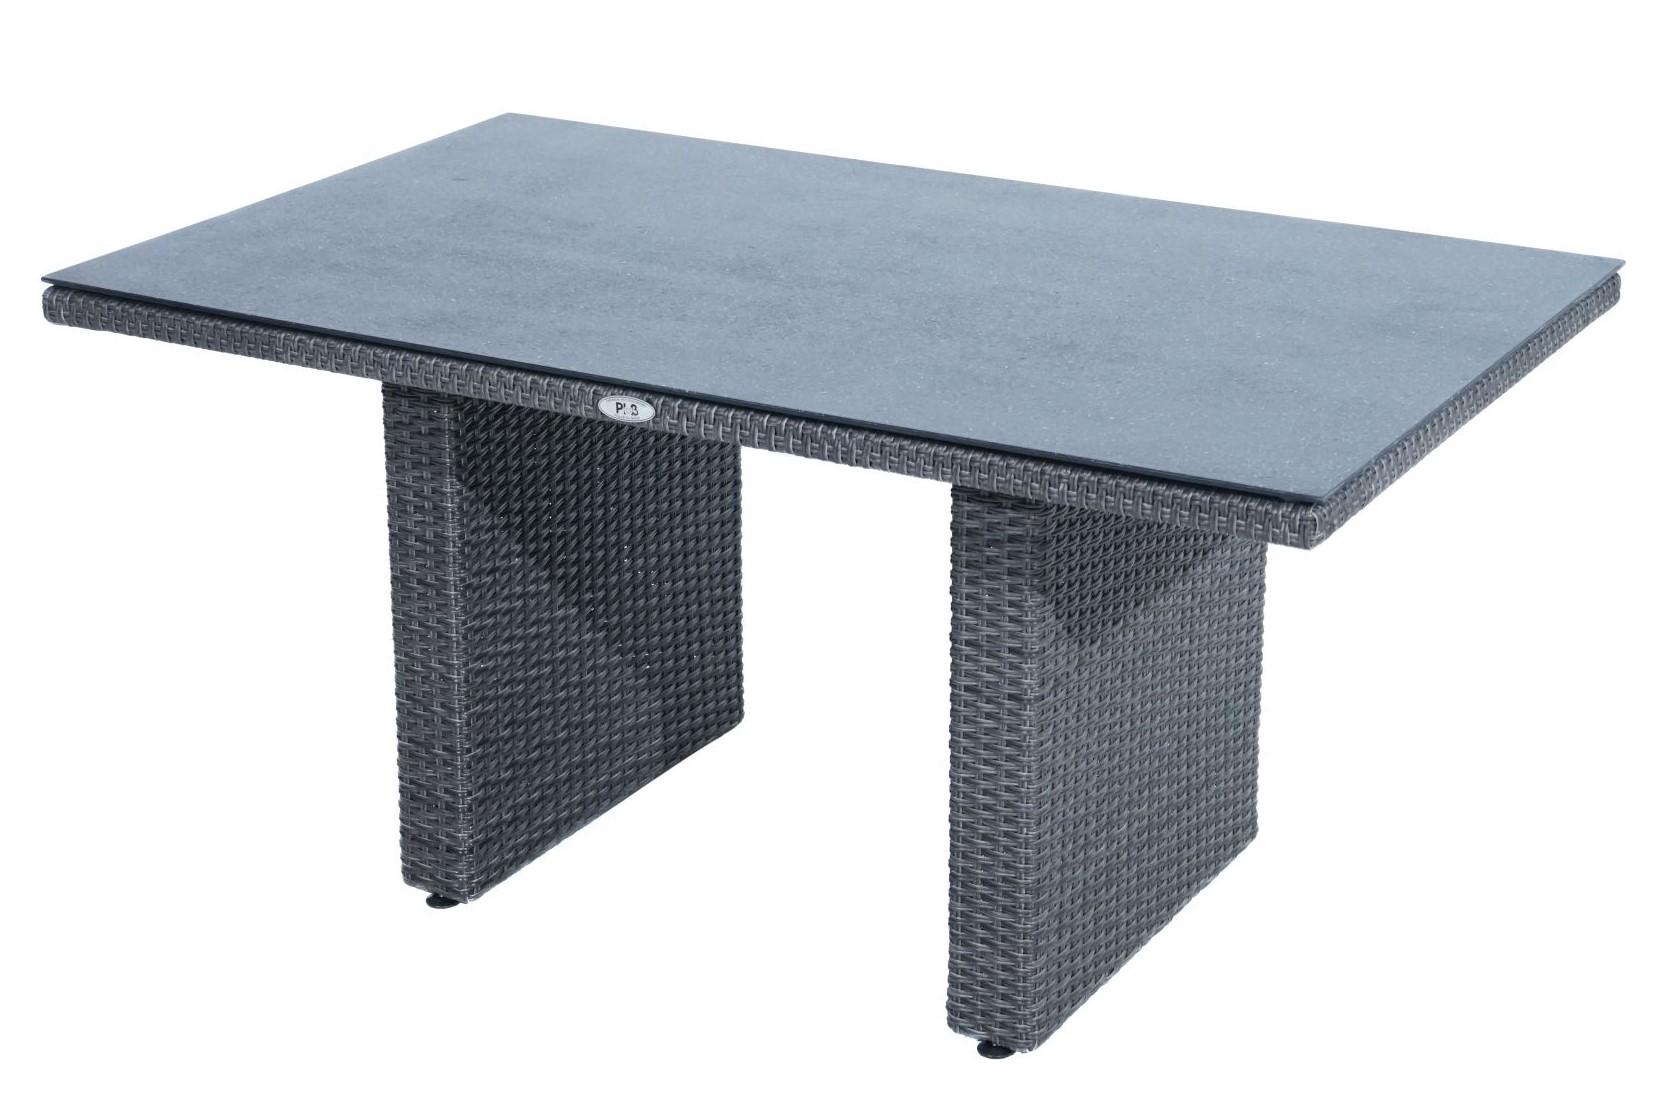 kaffeetisch rocking polyrattangeflecht 140x85cm. Black Bedroom Furniture Sets. Home Design Ideas